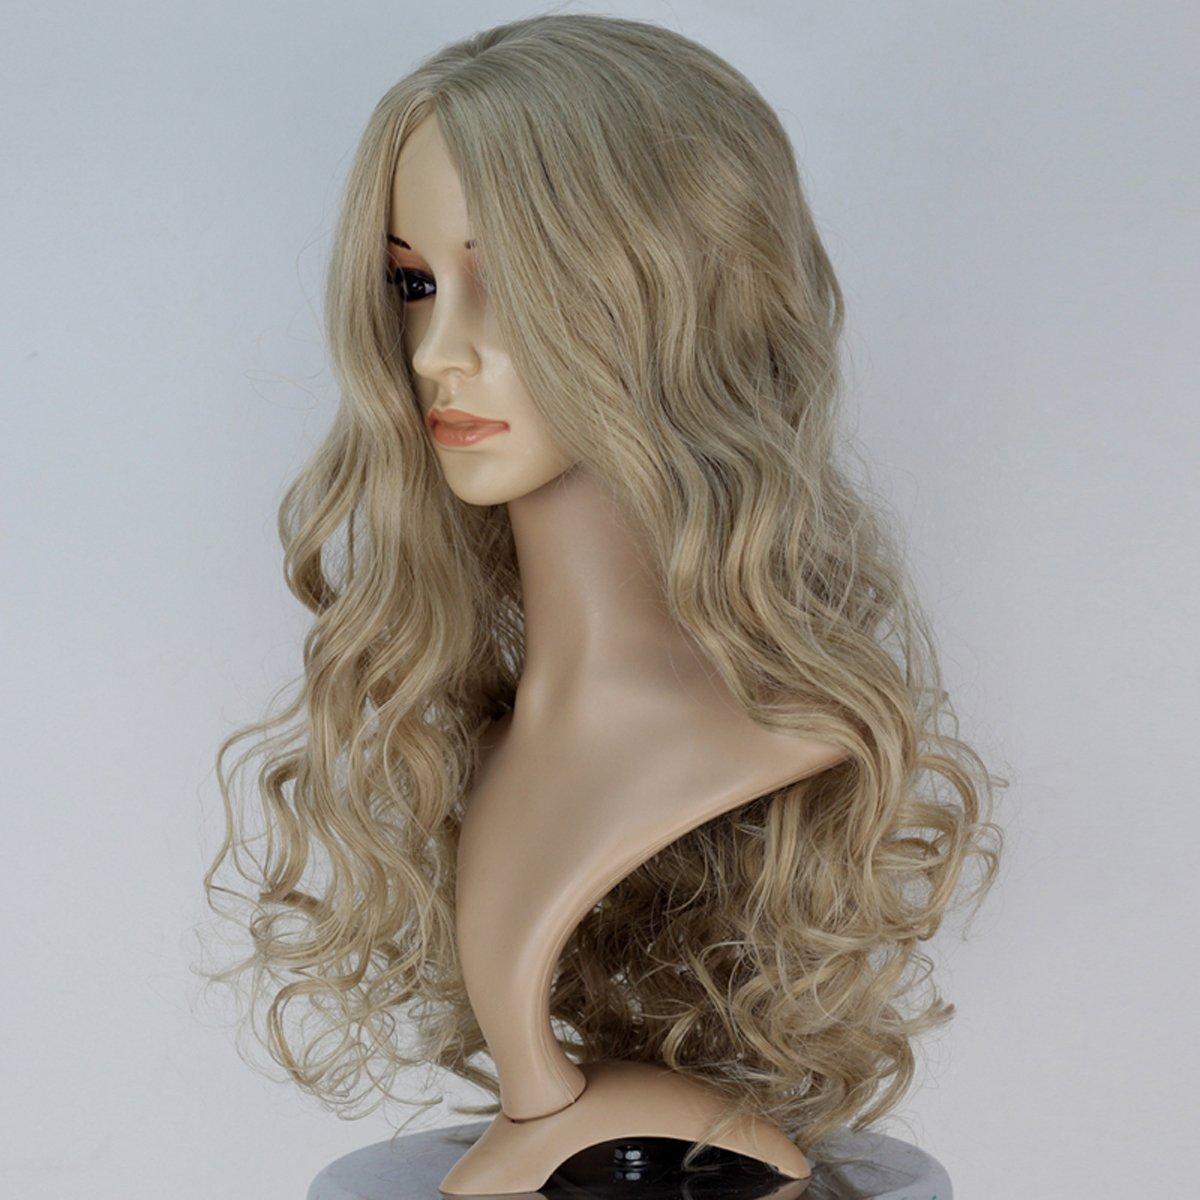 B010U6IO42 Miss U Hair Princess Wig Long Curly Ash Blonde Color Adult Cosplay Costume Full Wig 61PewuoncuL